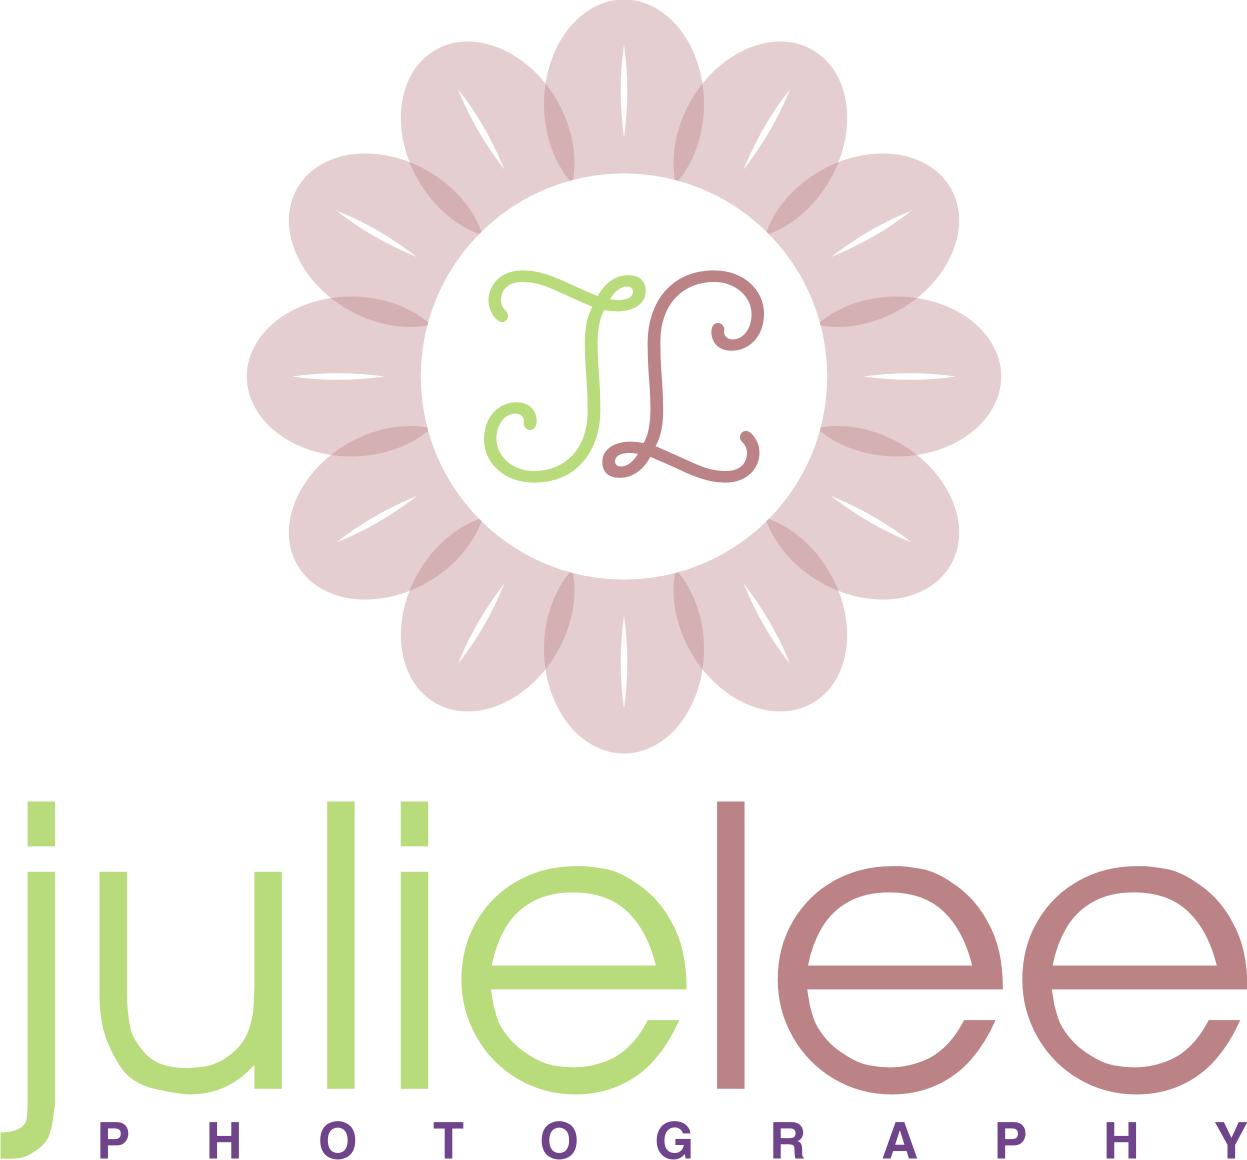 Julie Lee Photography